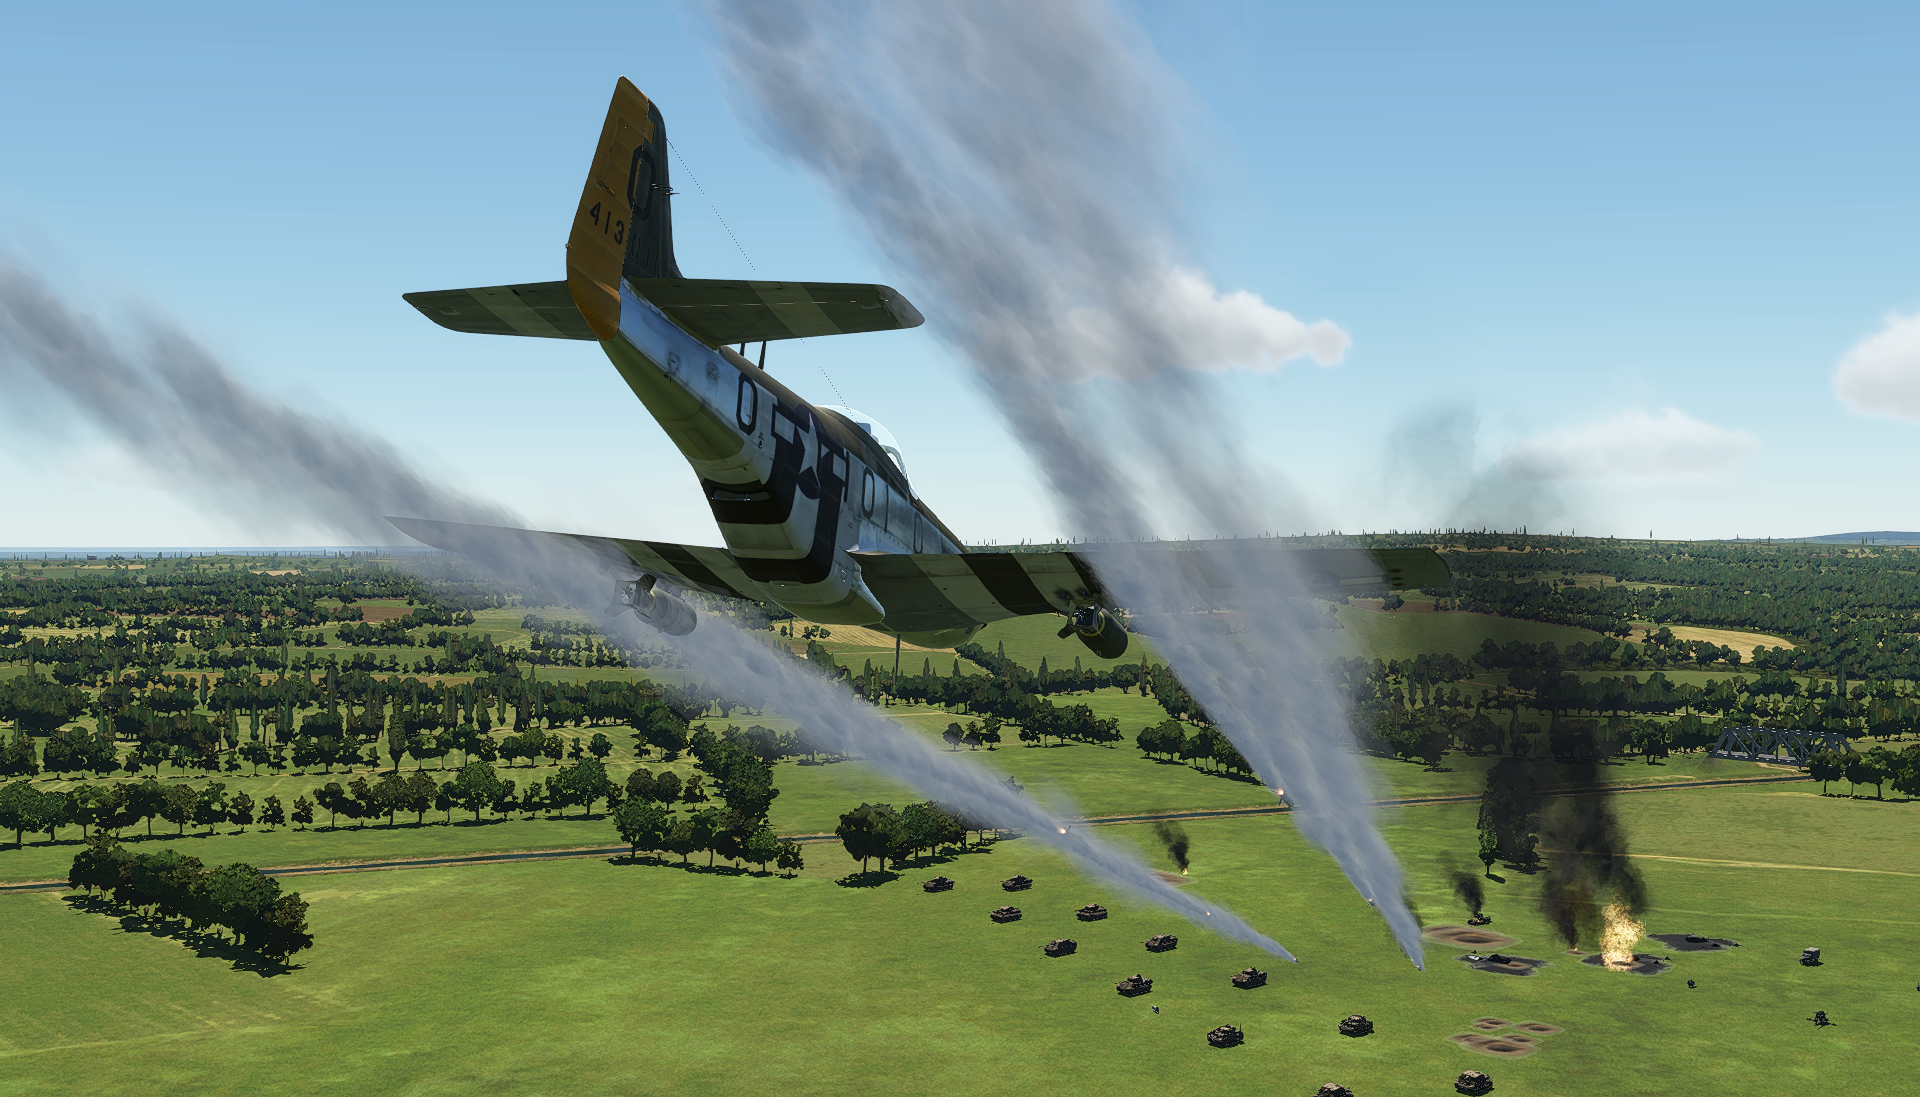 Entrainement attaque au sol sur P51 Obus2